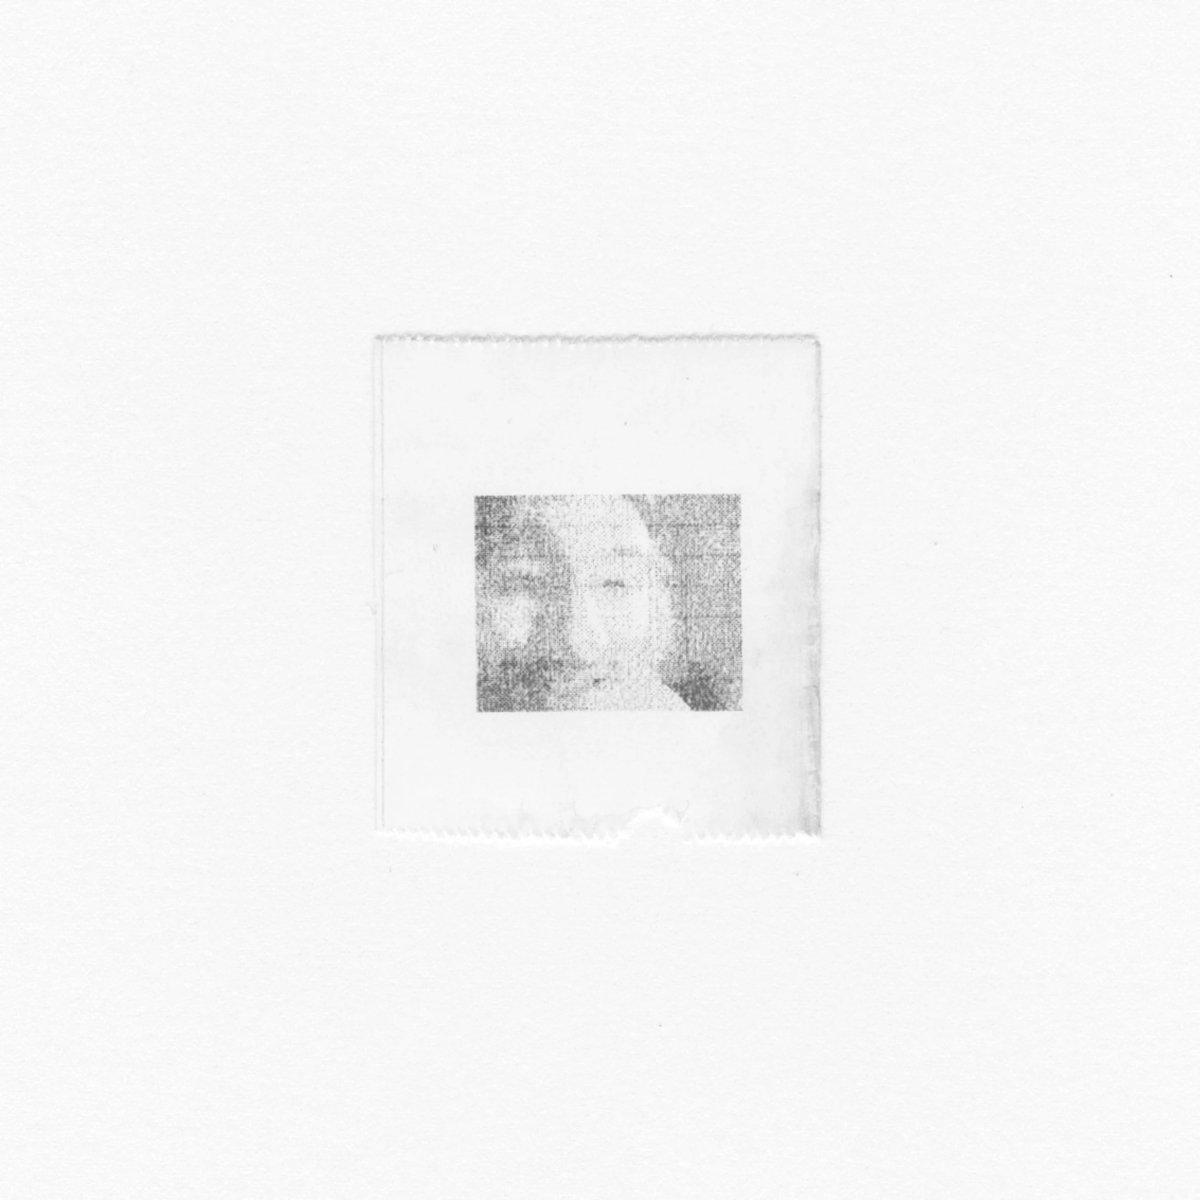 nintendo-gameboy-camera-01